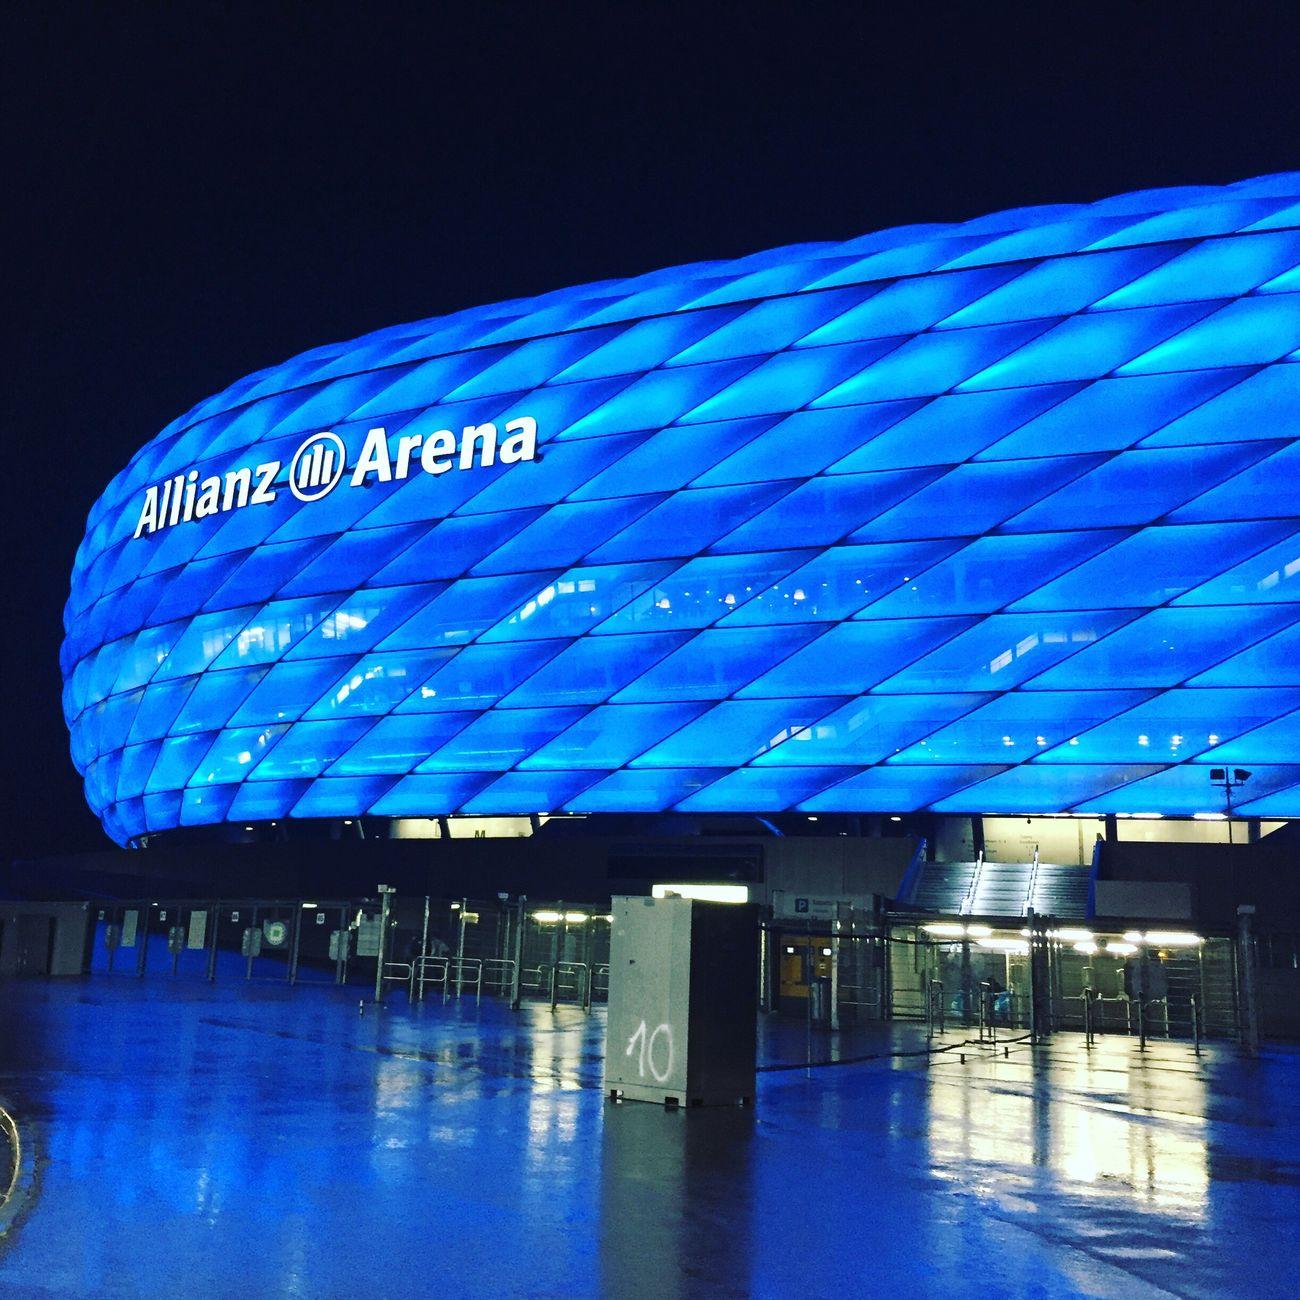 Allianz Arena in blue. Blue Arena Allianzarena 1860 FCB Munich München Bayern Soccer Fussball Bundesliga Architecture City Built Structure Building 089 Minga Blau